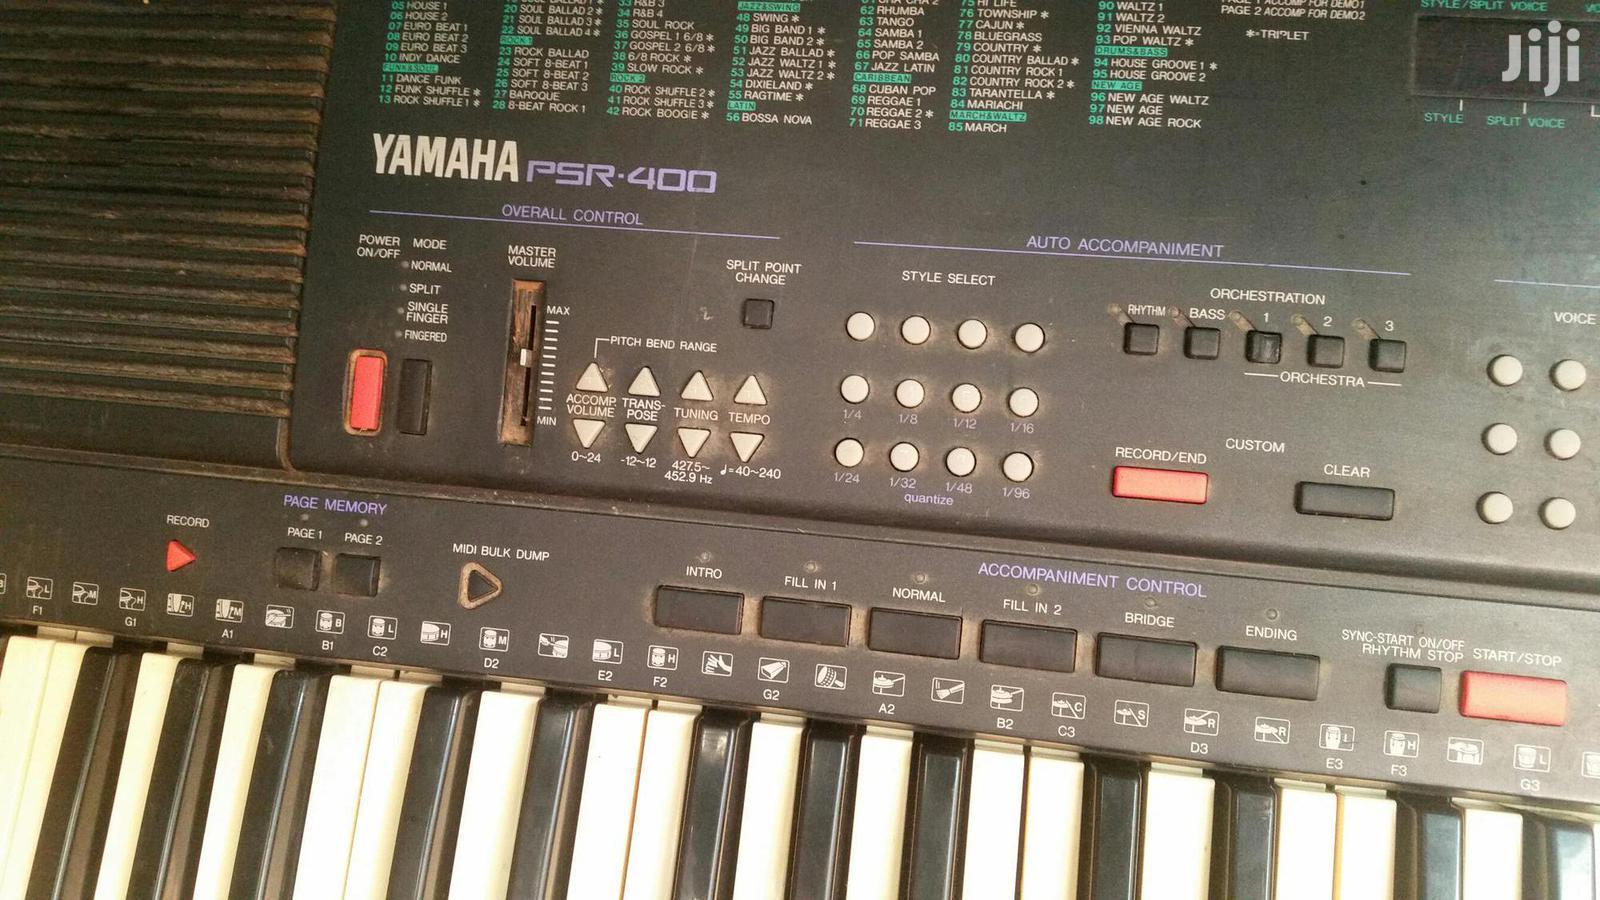 Yamaha Keyboard Piano | Musical Instruments & Gear for sale in Benin City, Edo State, Nigeria